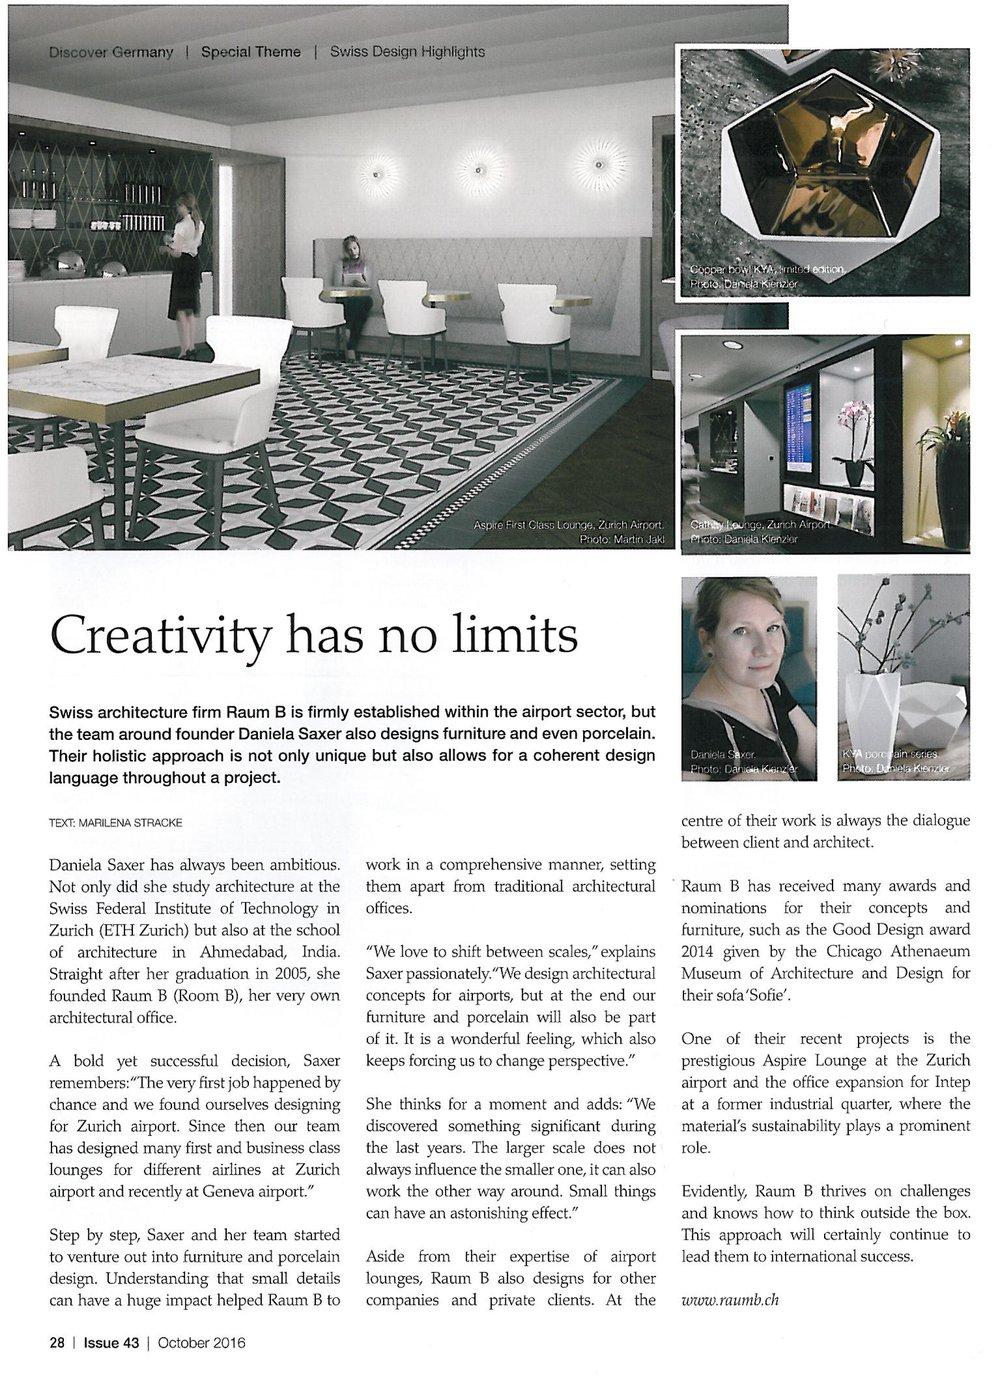 Creativity has no limits   Issue 43, October 2016, S. 28